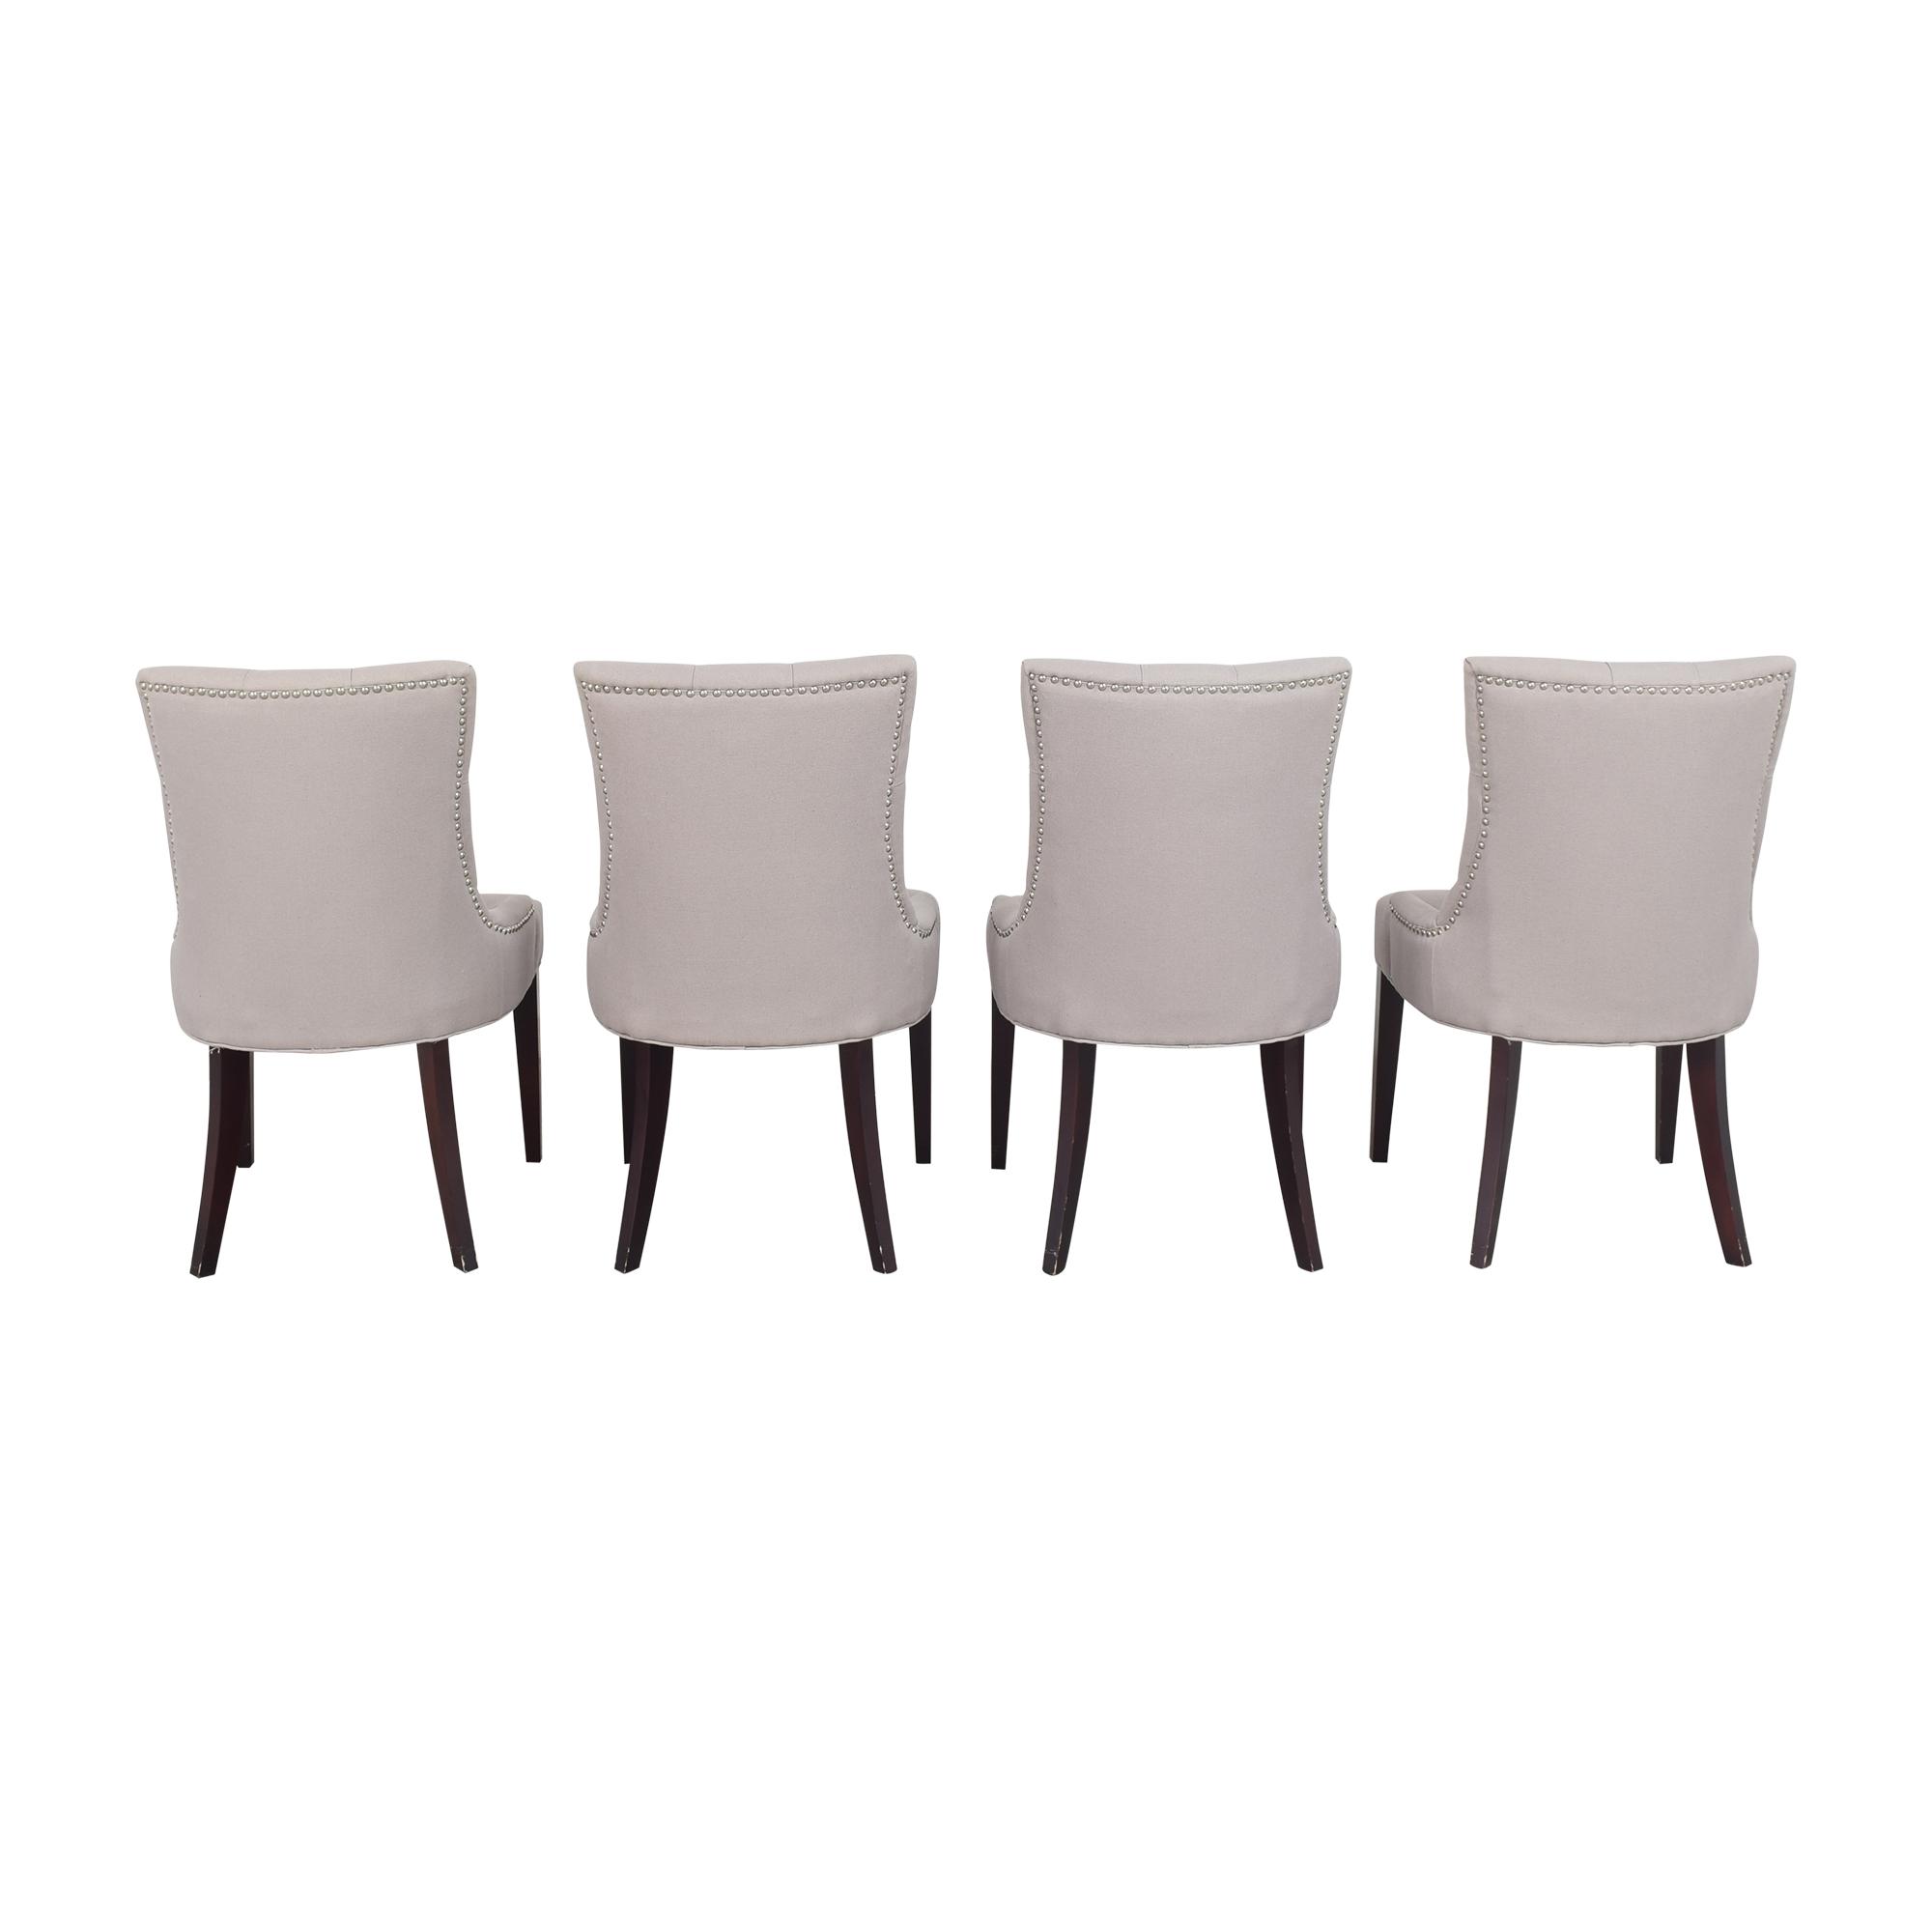 Safavieh Safavieh Nimes Tufted Dining Chairs discount